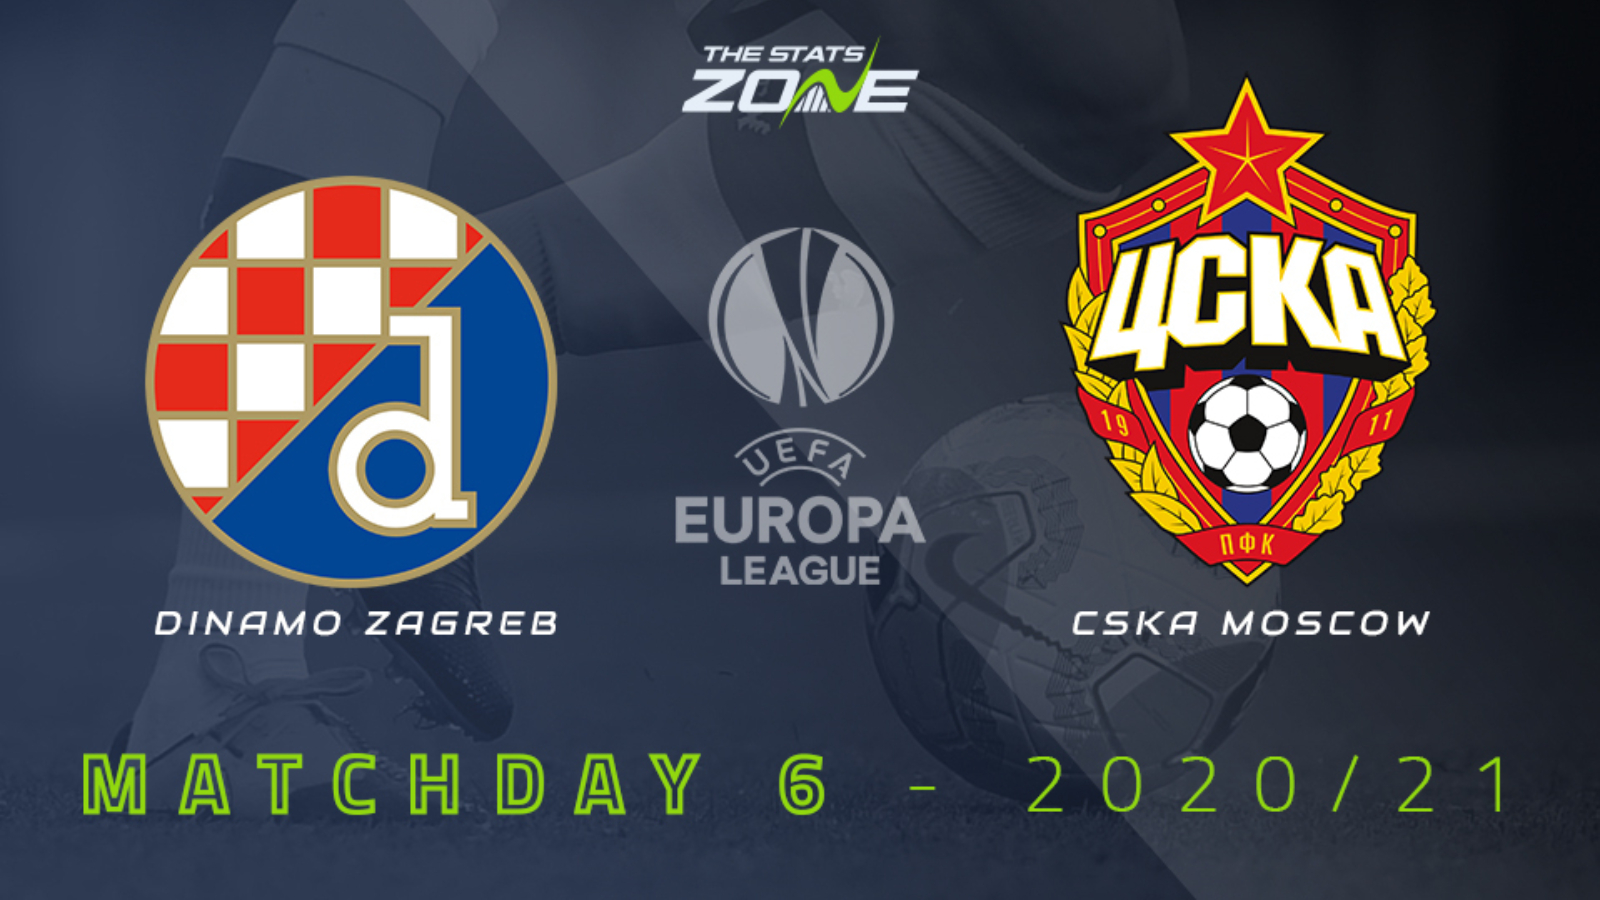 2020 21 Uefa Europa League Dinamo Zagreb Vs Cska Moscow Preview Prediction The Stats Zone